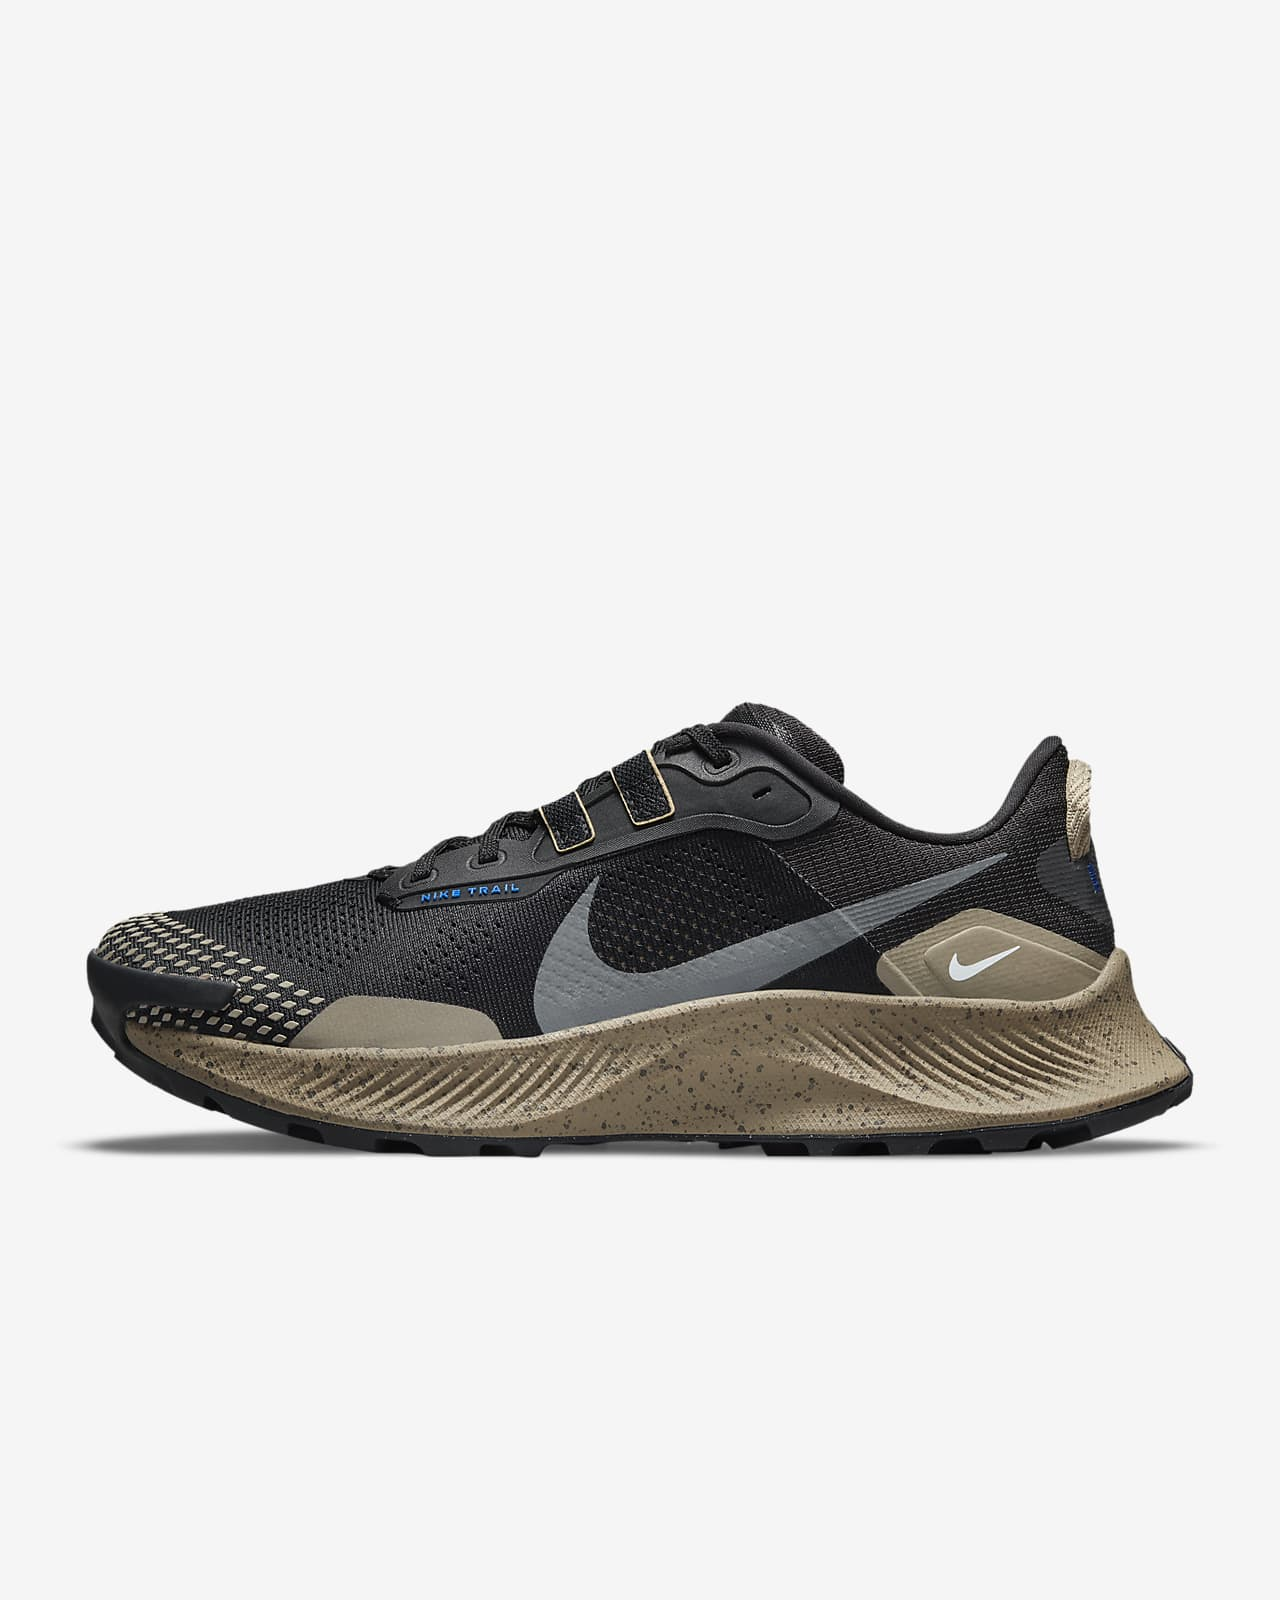 Nike Pegasus Trail 3 Zapatillas de trail running - Hombre